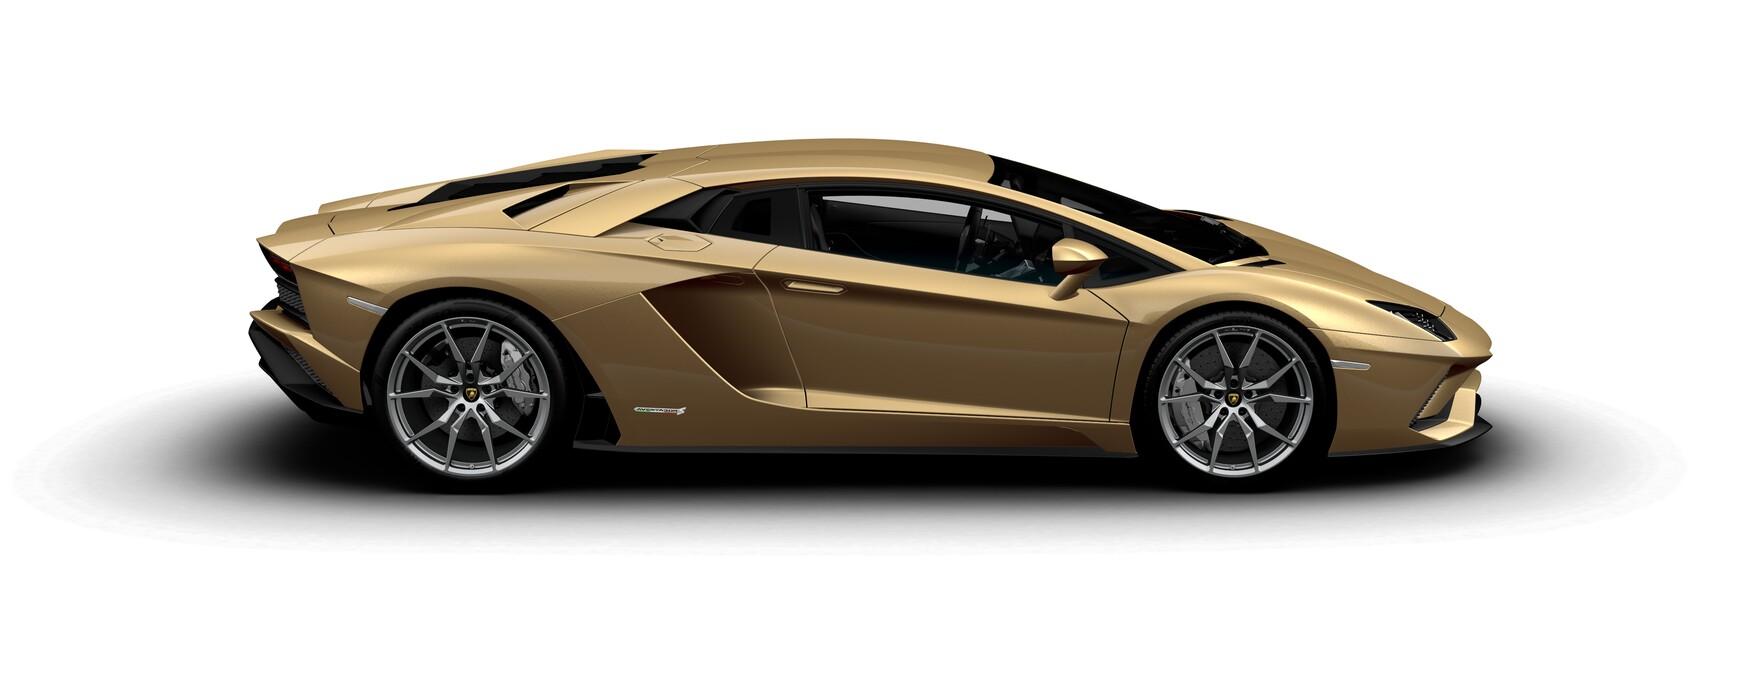 Lamborghini Aventador S Coupe metallic Oro Elios side view